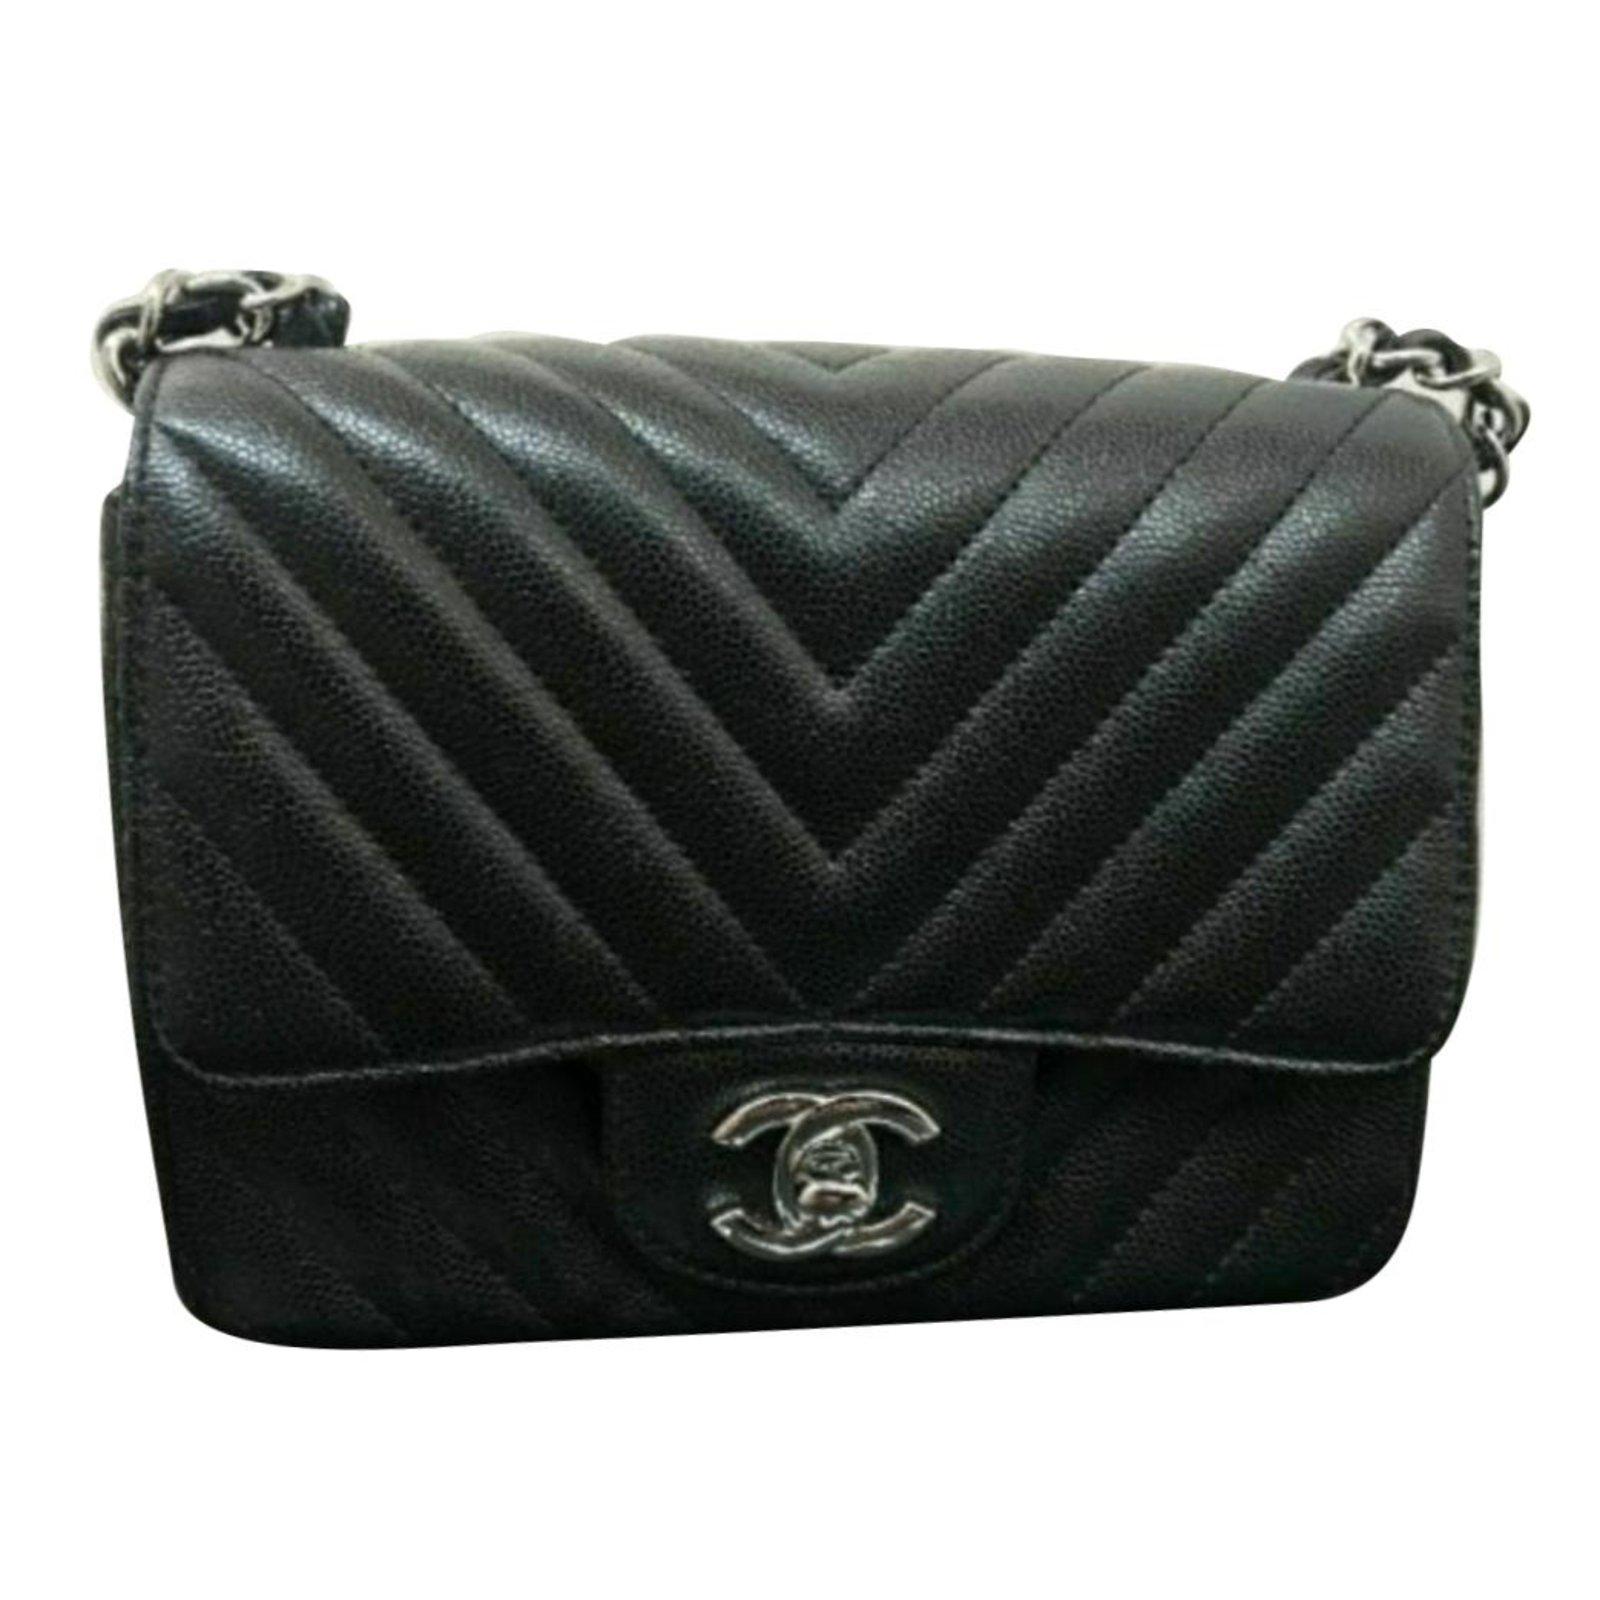 51032773856f36 Chanel Mini square caviar bag Handbags Leather Black ref.68352 ...